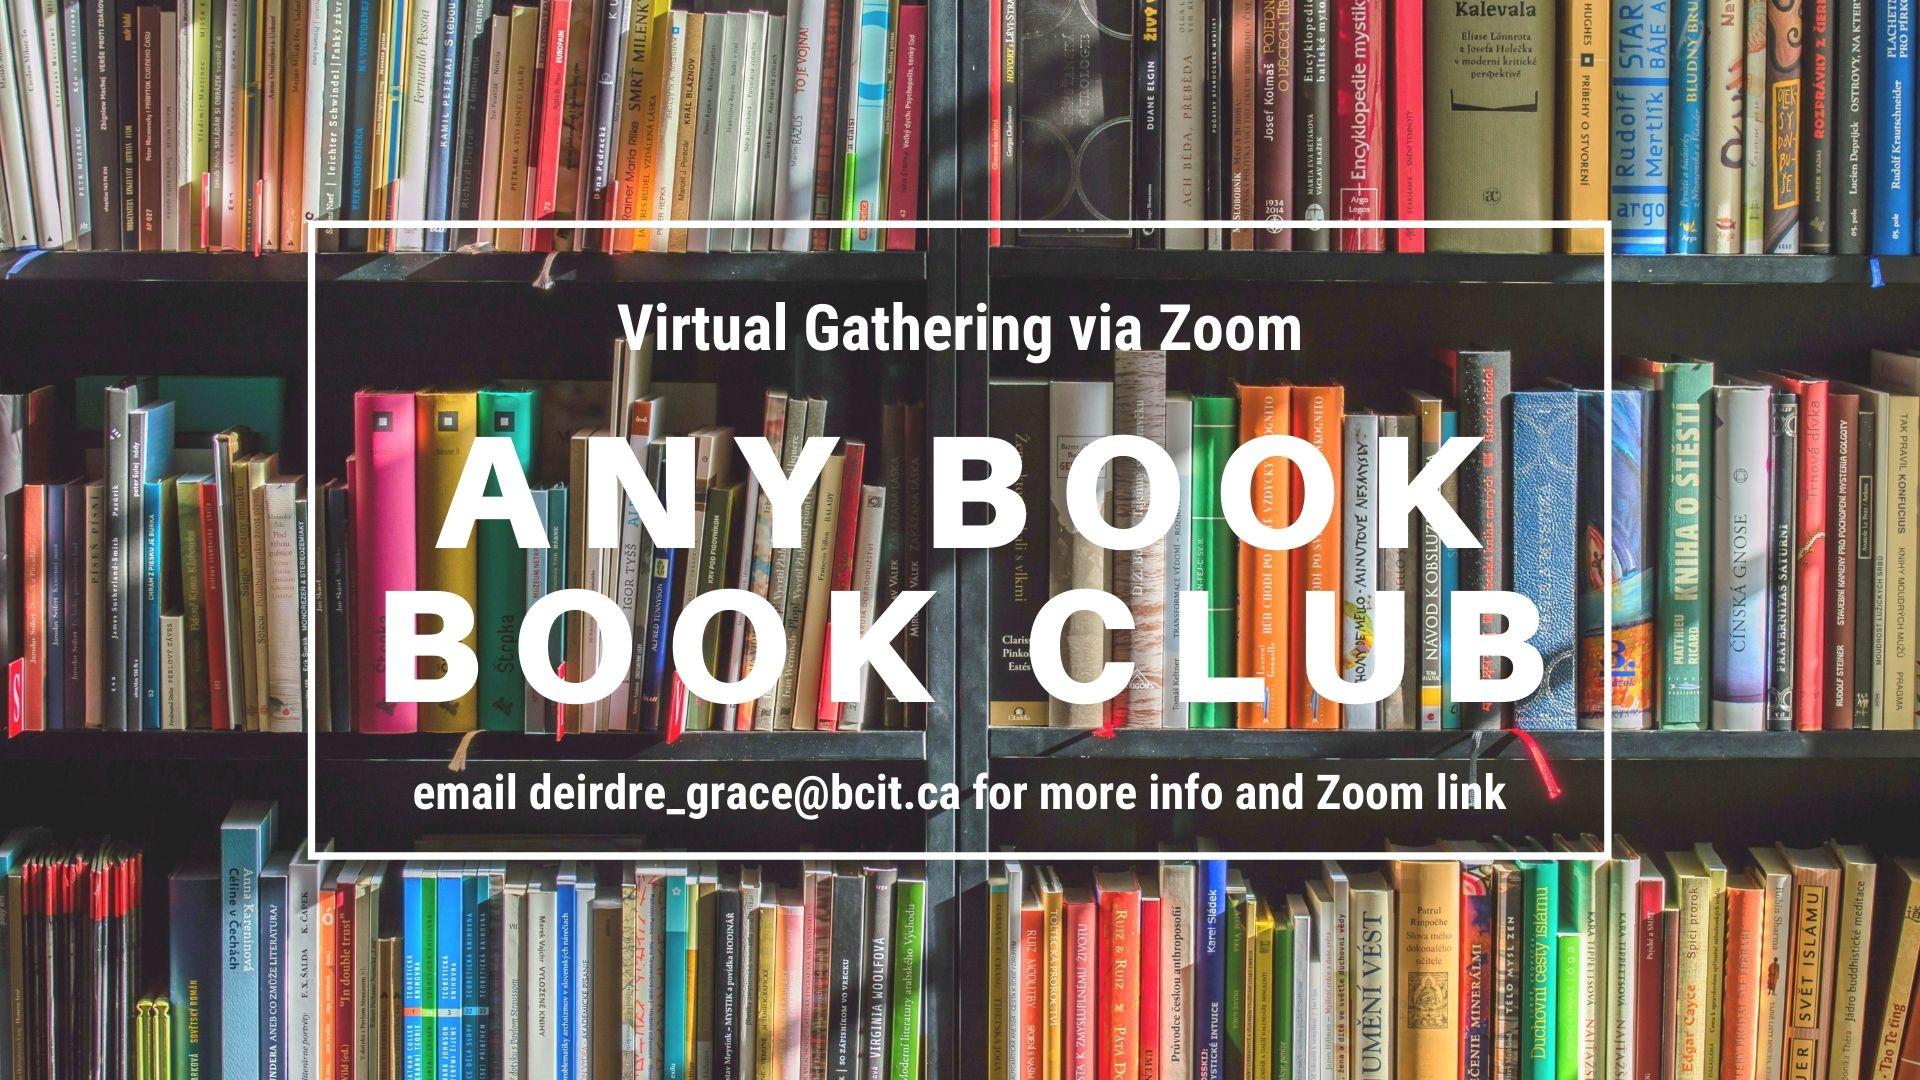 Any Book Book Club